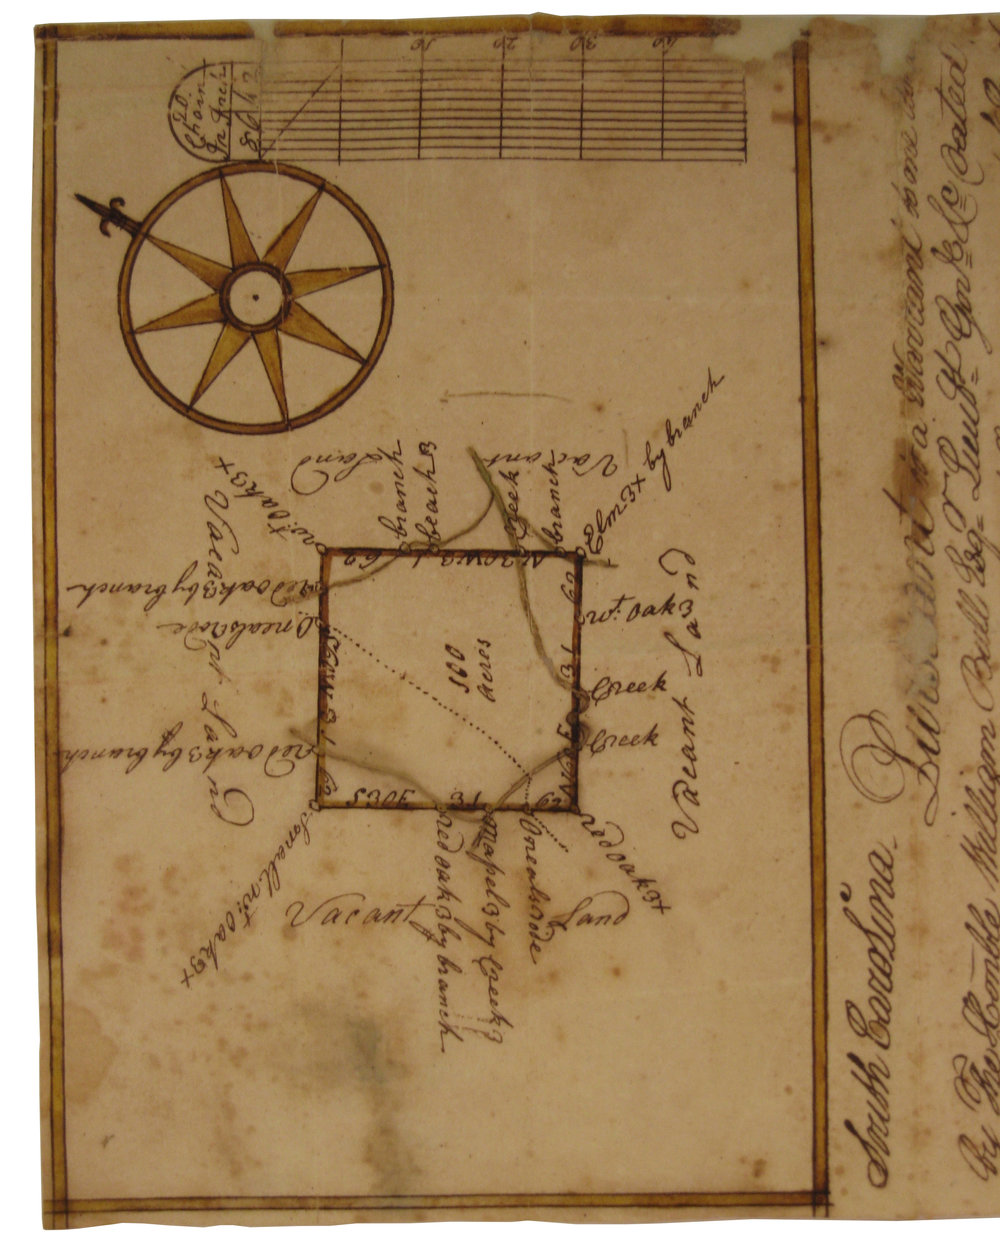 Surveying Map, 1770